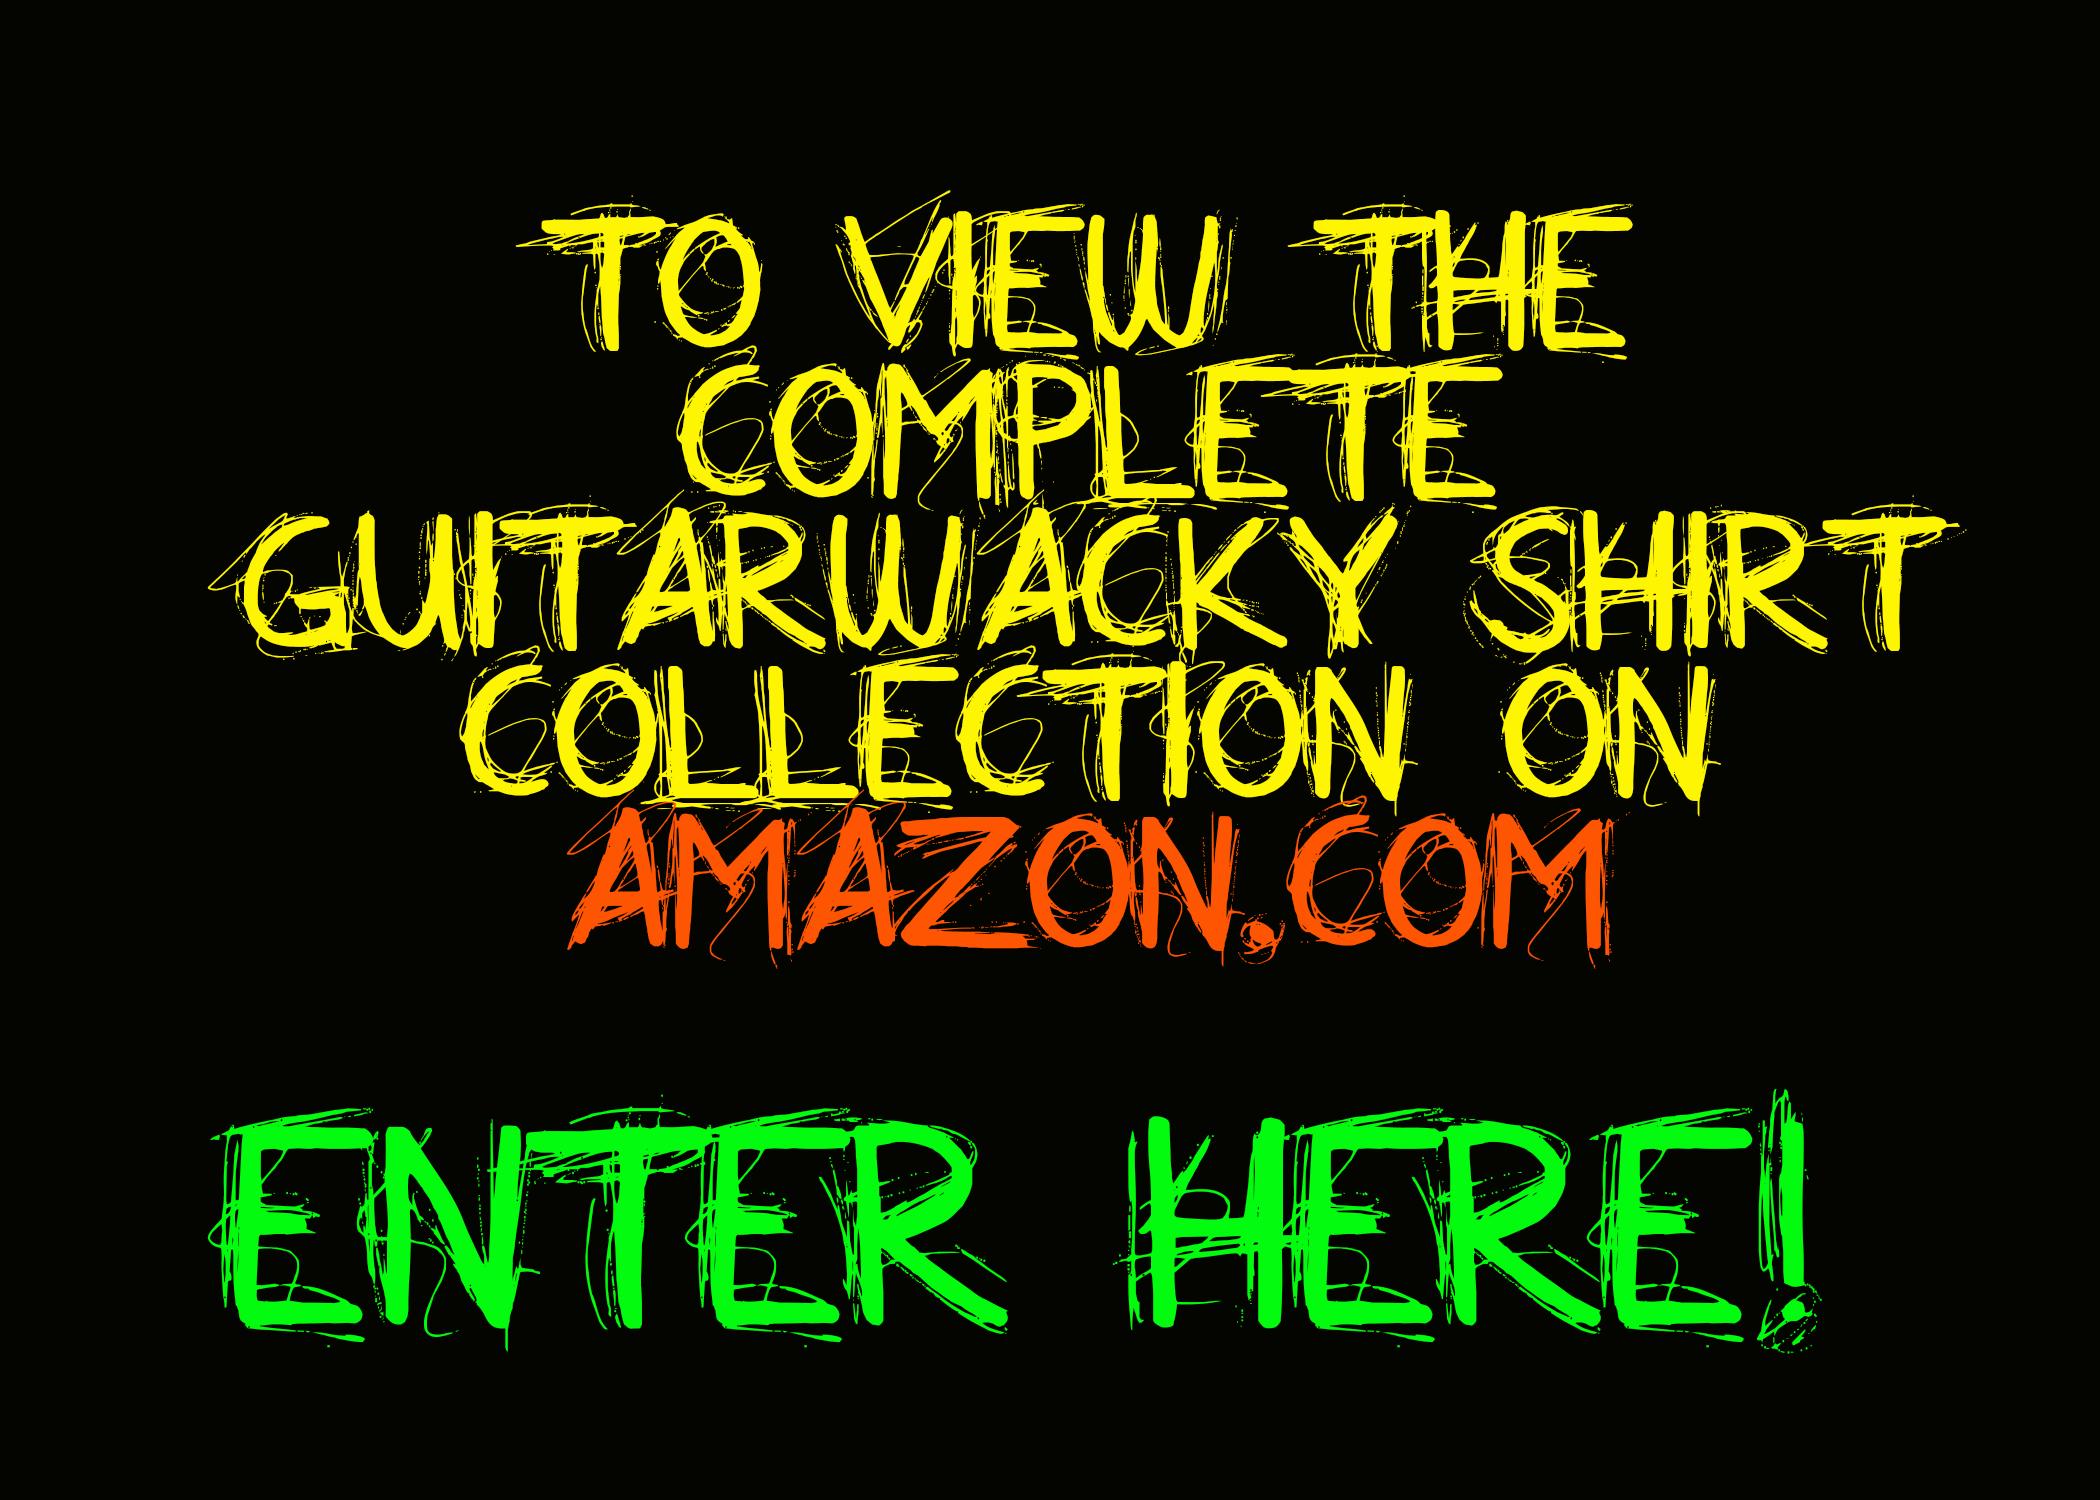 Guitarwacky T-Shirt Collection on Amazon